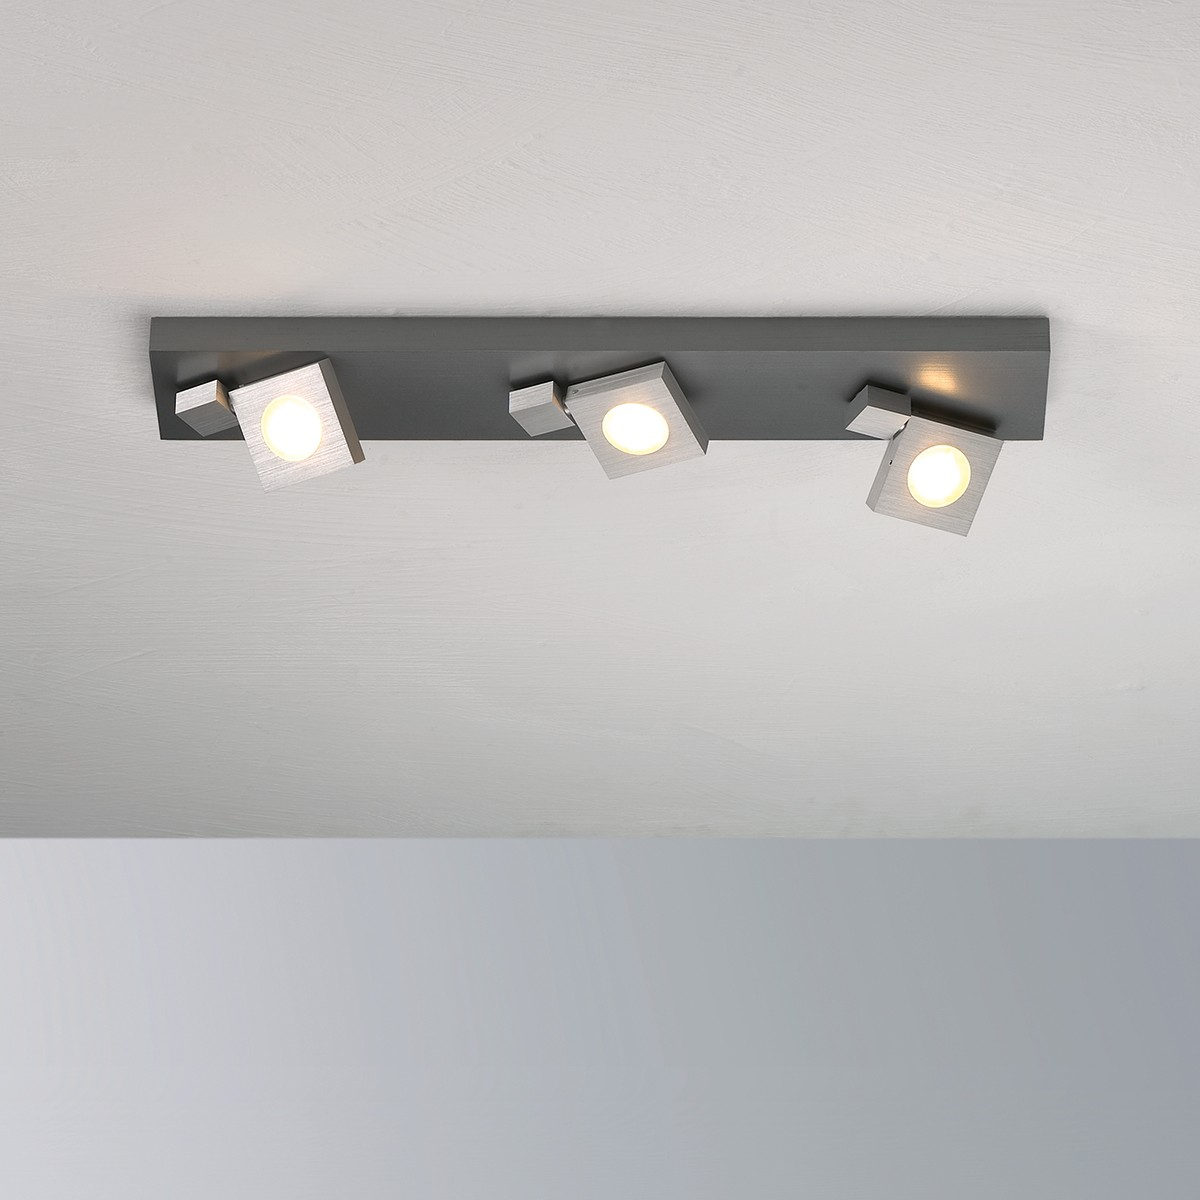 Bopp Flash LED Deckenleuchte 3-flg., Aluminium geschliffen - anthrazit lackiert